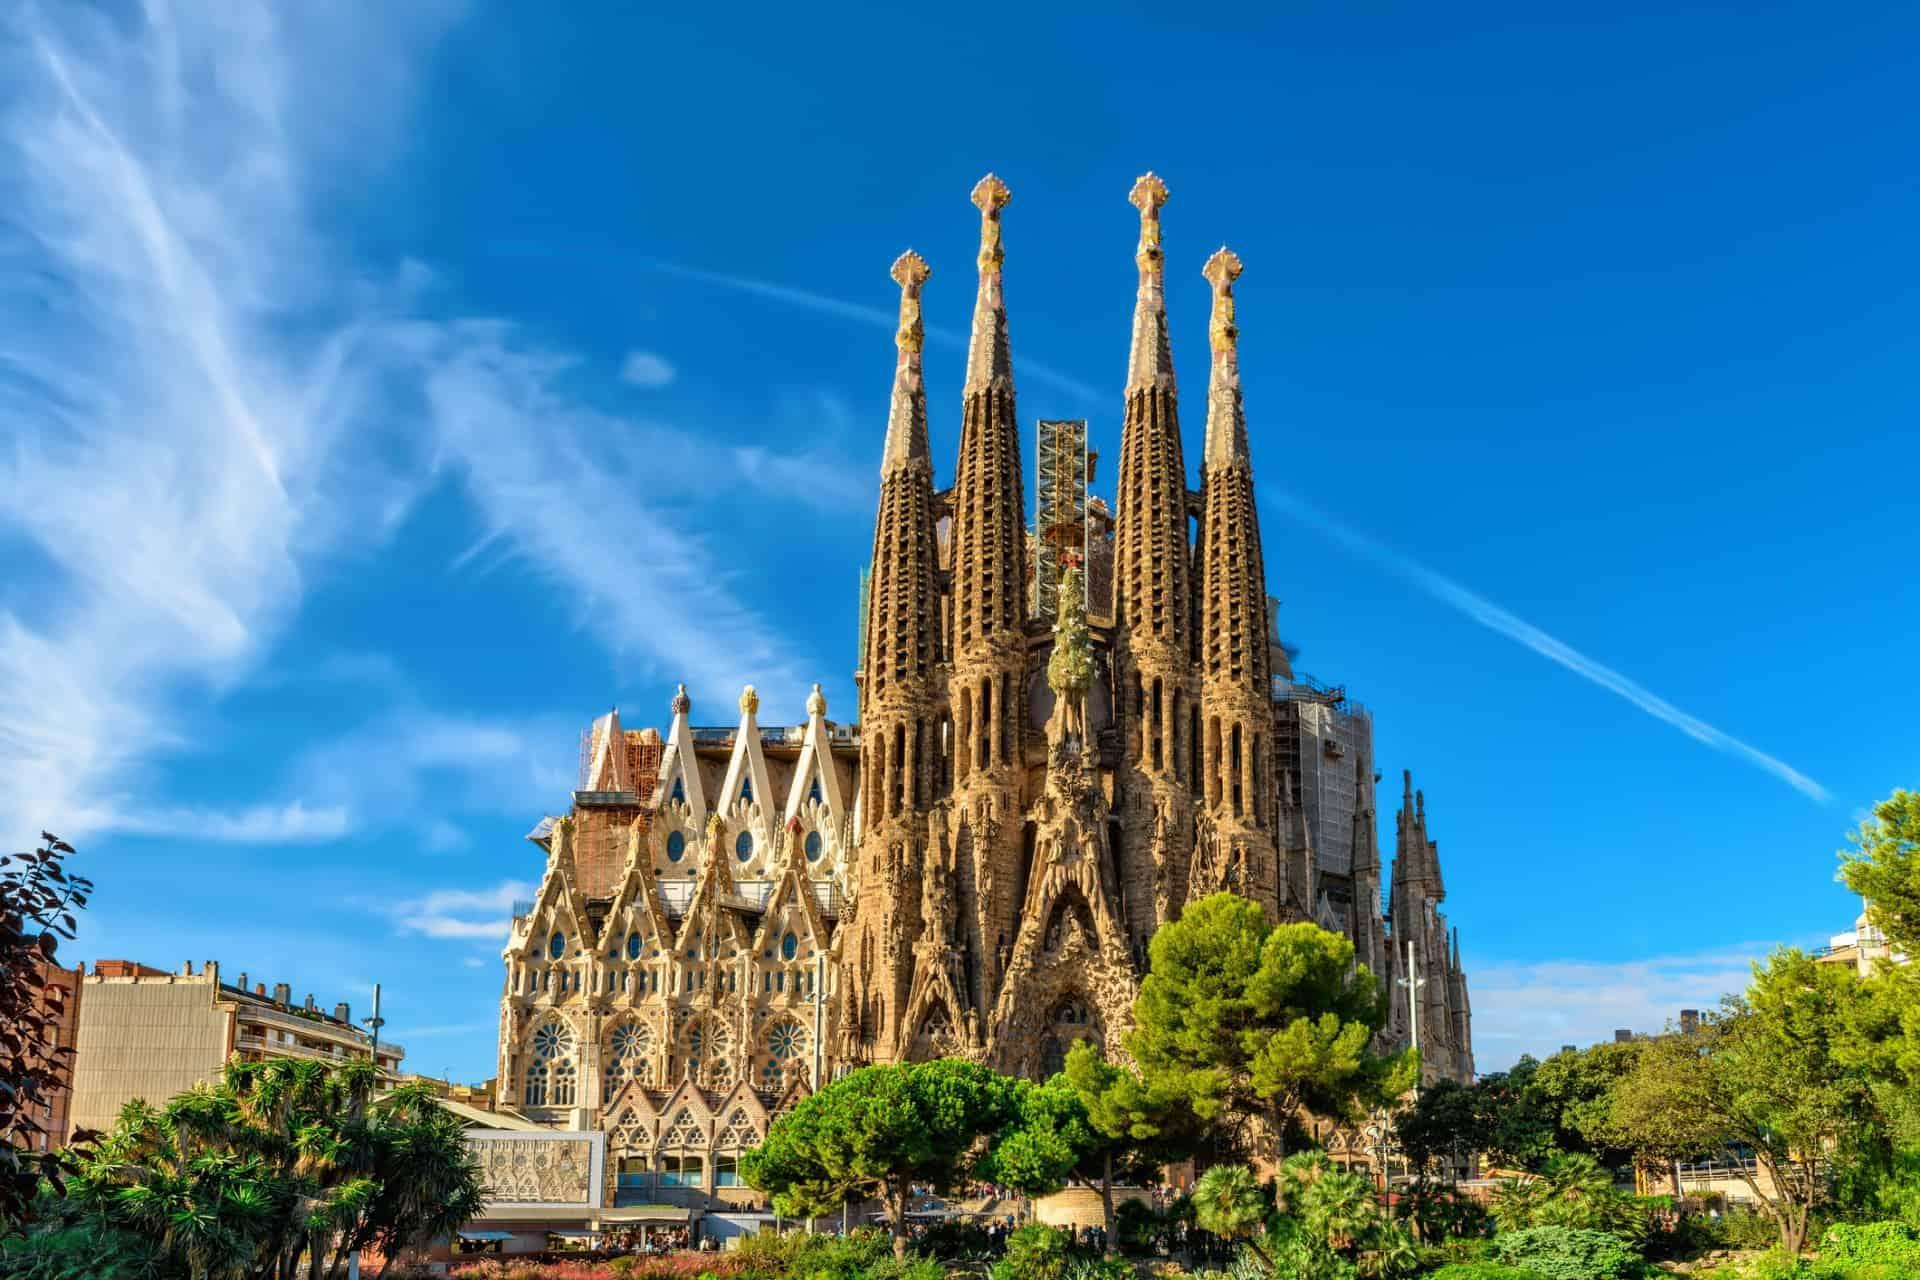 La Sagrada Familia Gaudi, Barcelona